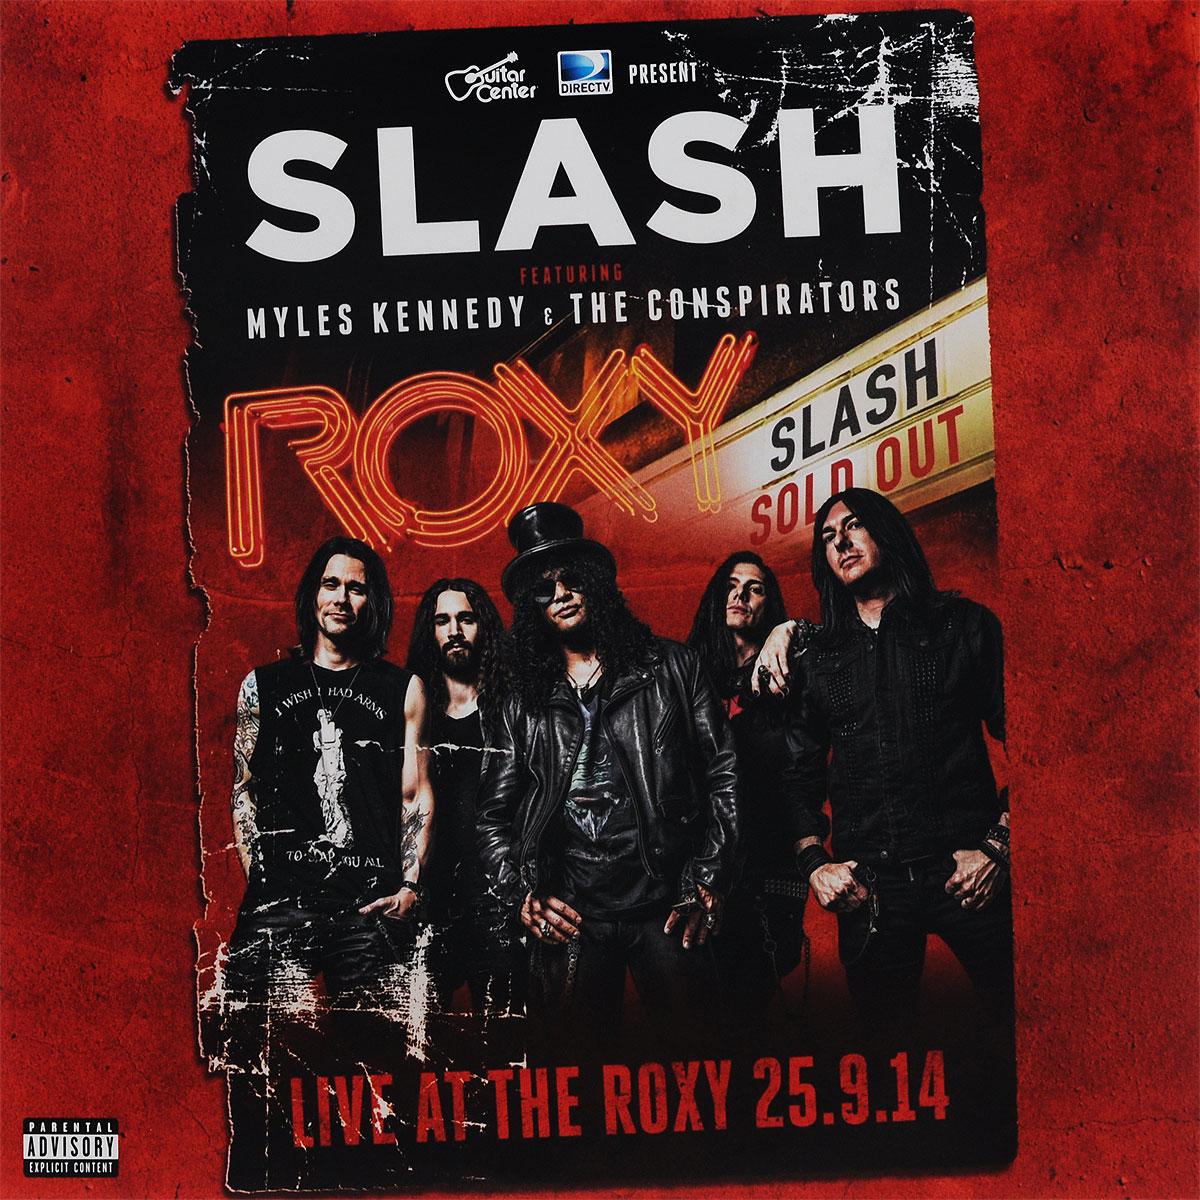 Slash,Майлс Кеннеди,The Conspirators Slash Featuring Myles Kennedy & The Conspirators. Live At The Roxy 25.09.14 (3 LP) slash slash world on fire 2 lp